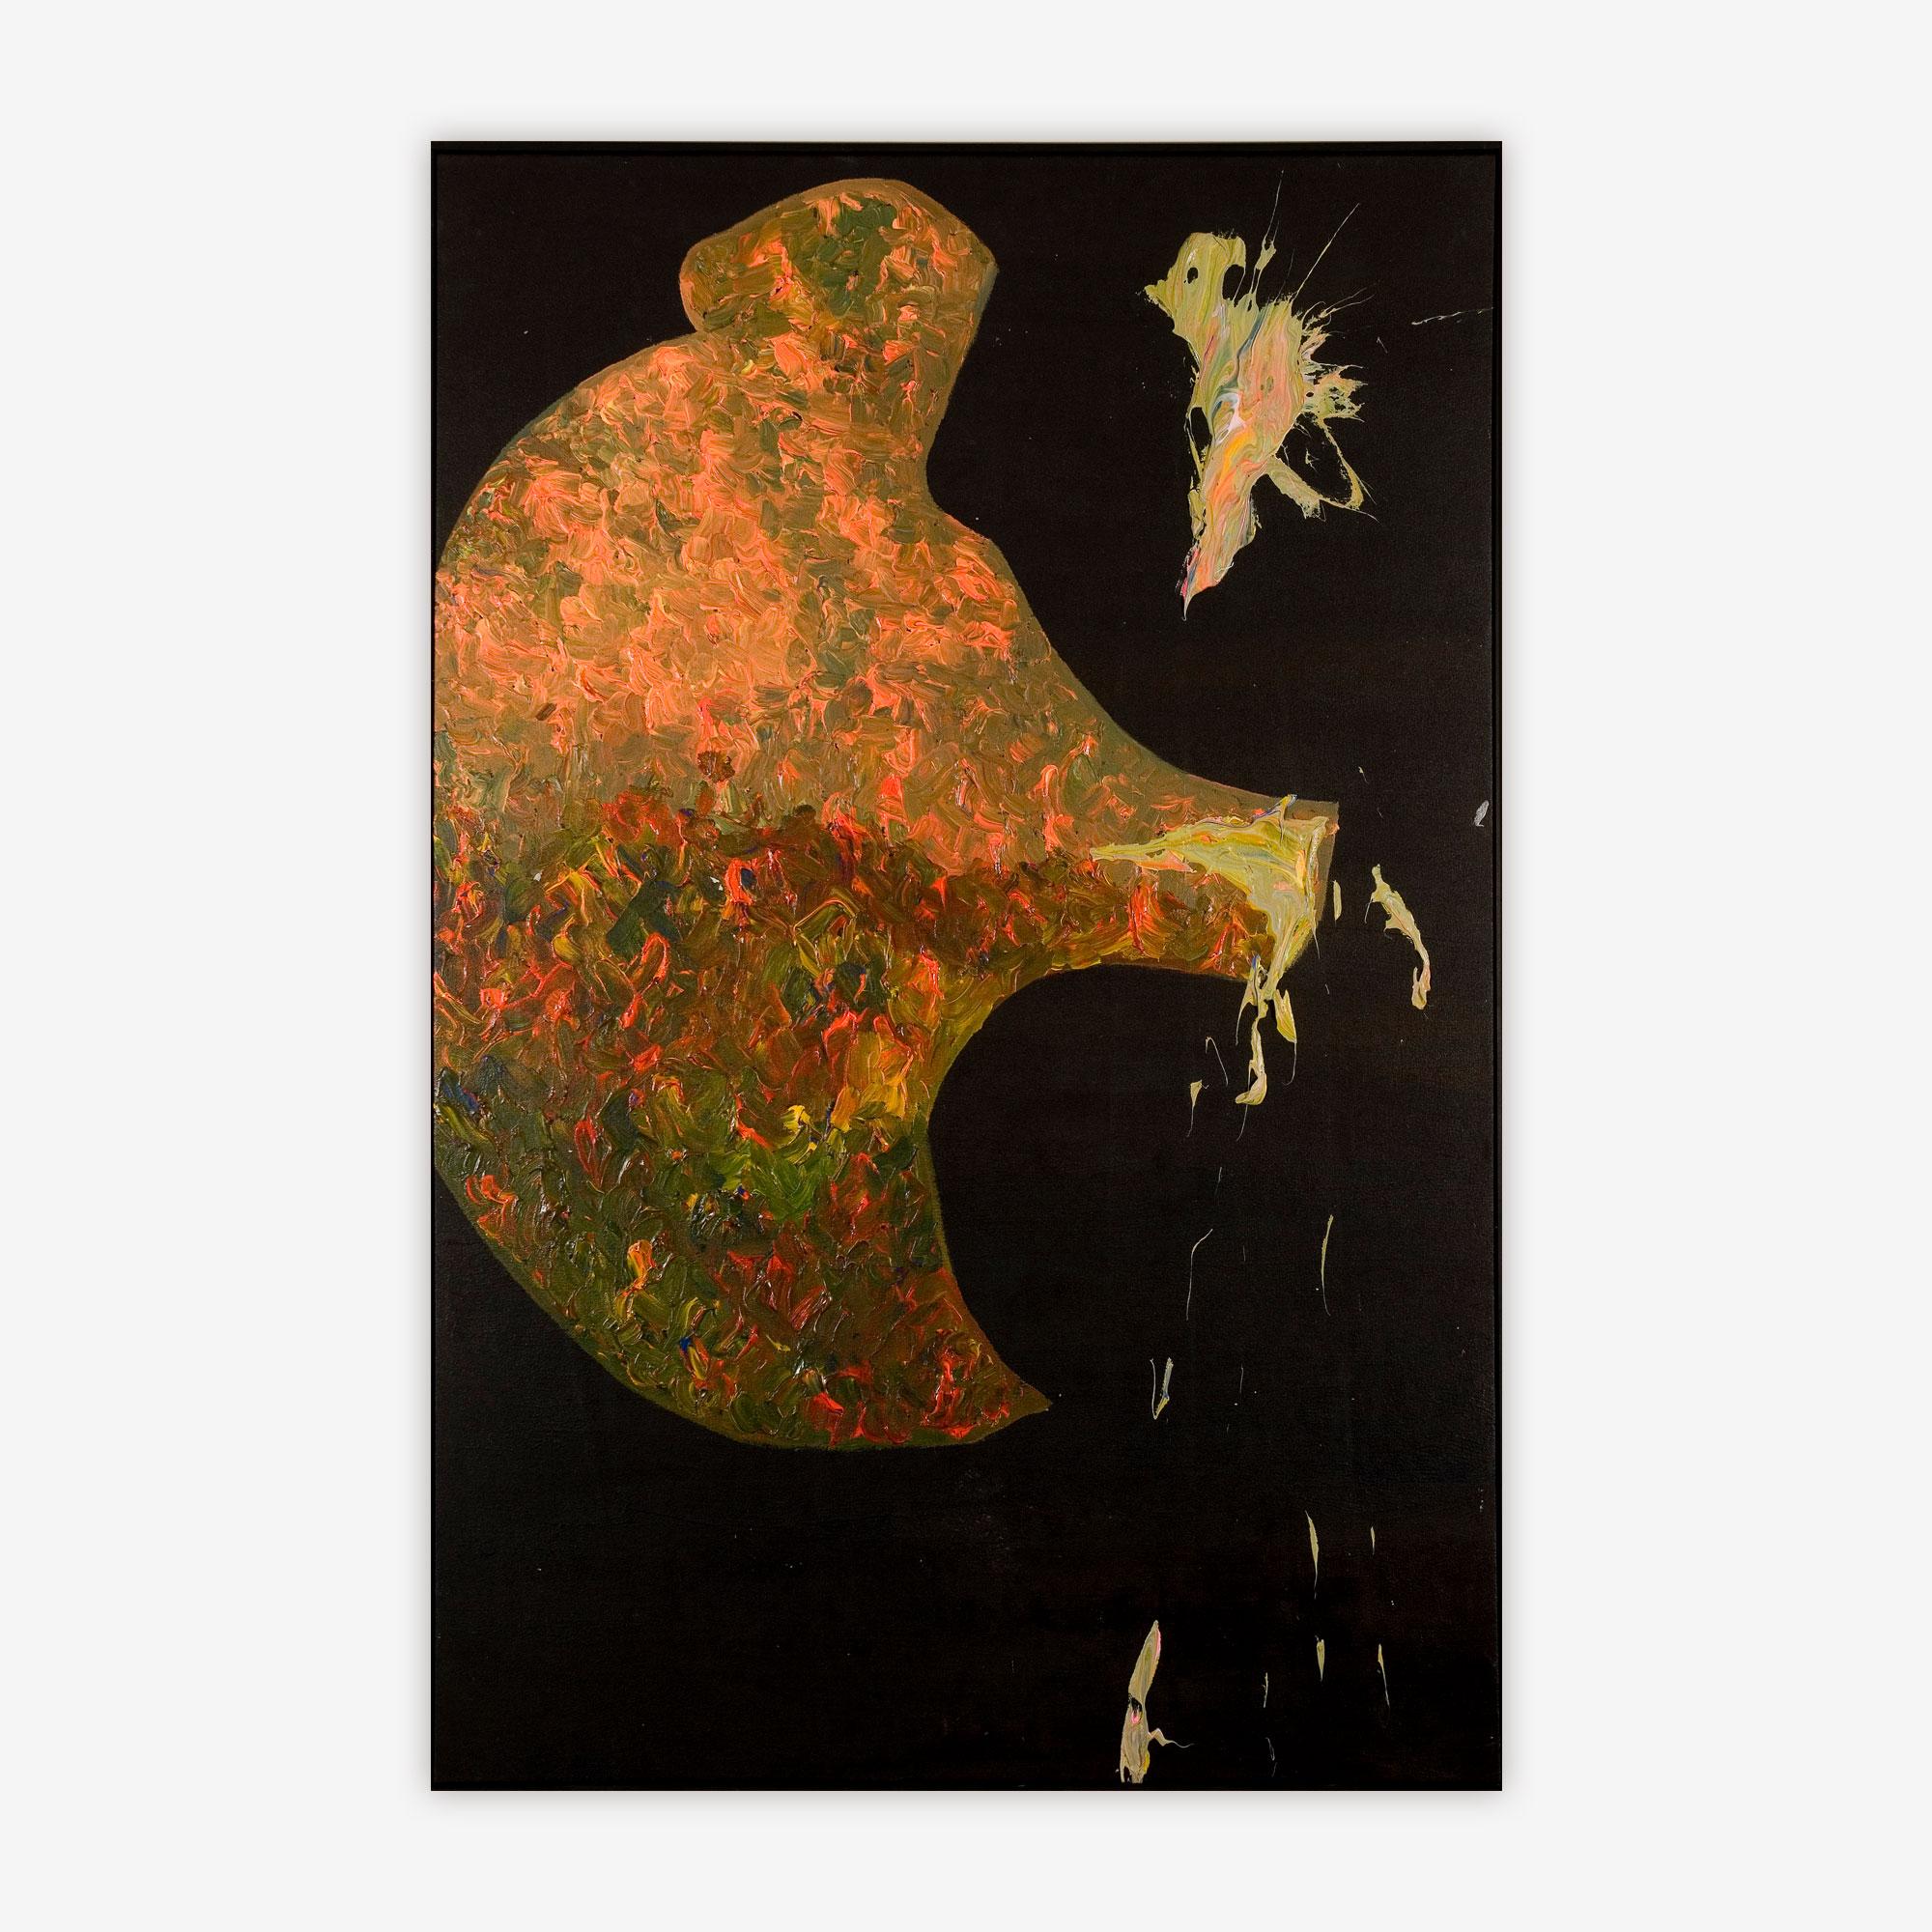 Untitled by Misty Hockenbury